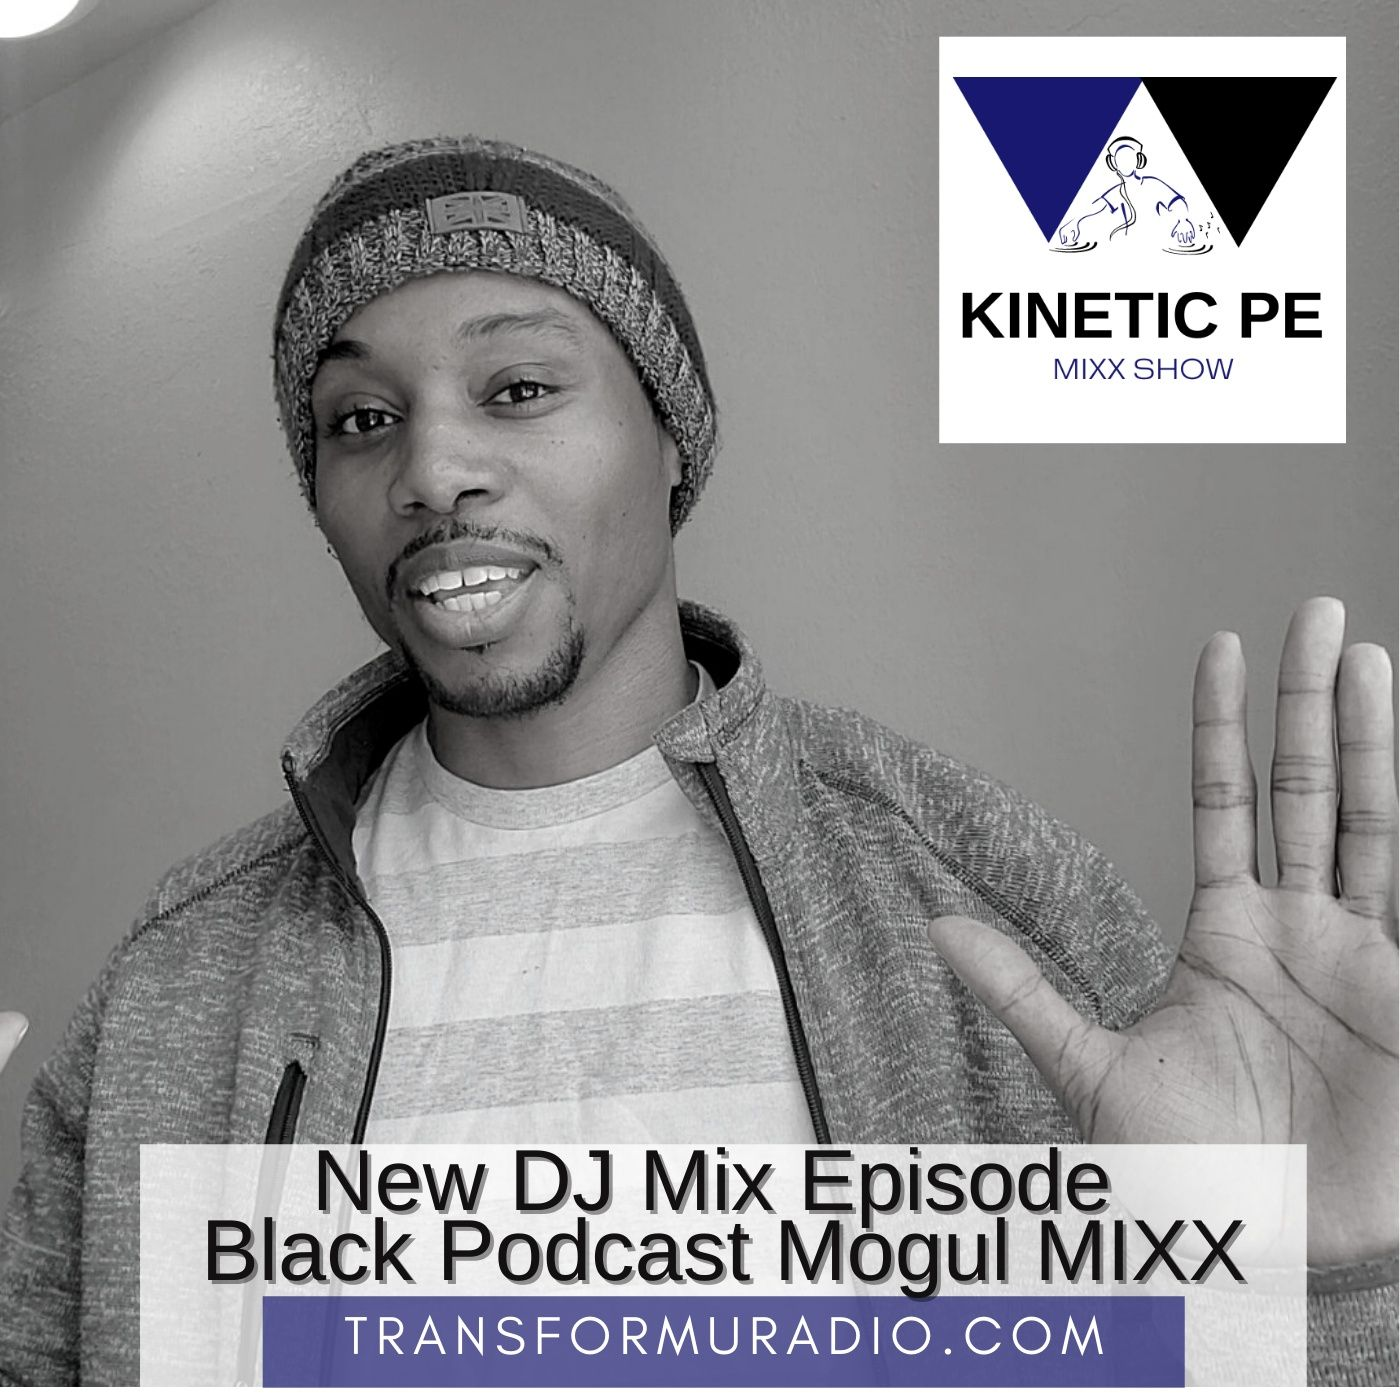 Movie Soundtrack Producer and Artist Player Pree talks Journey to Be a Podcast Mogul